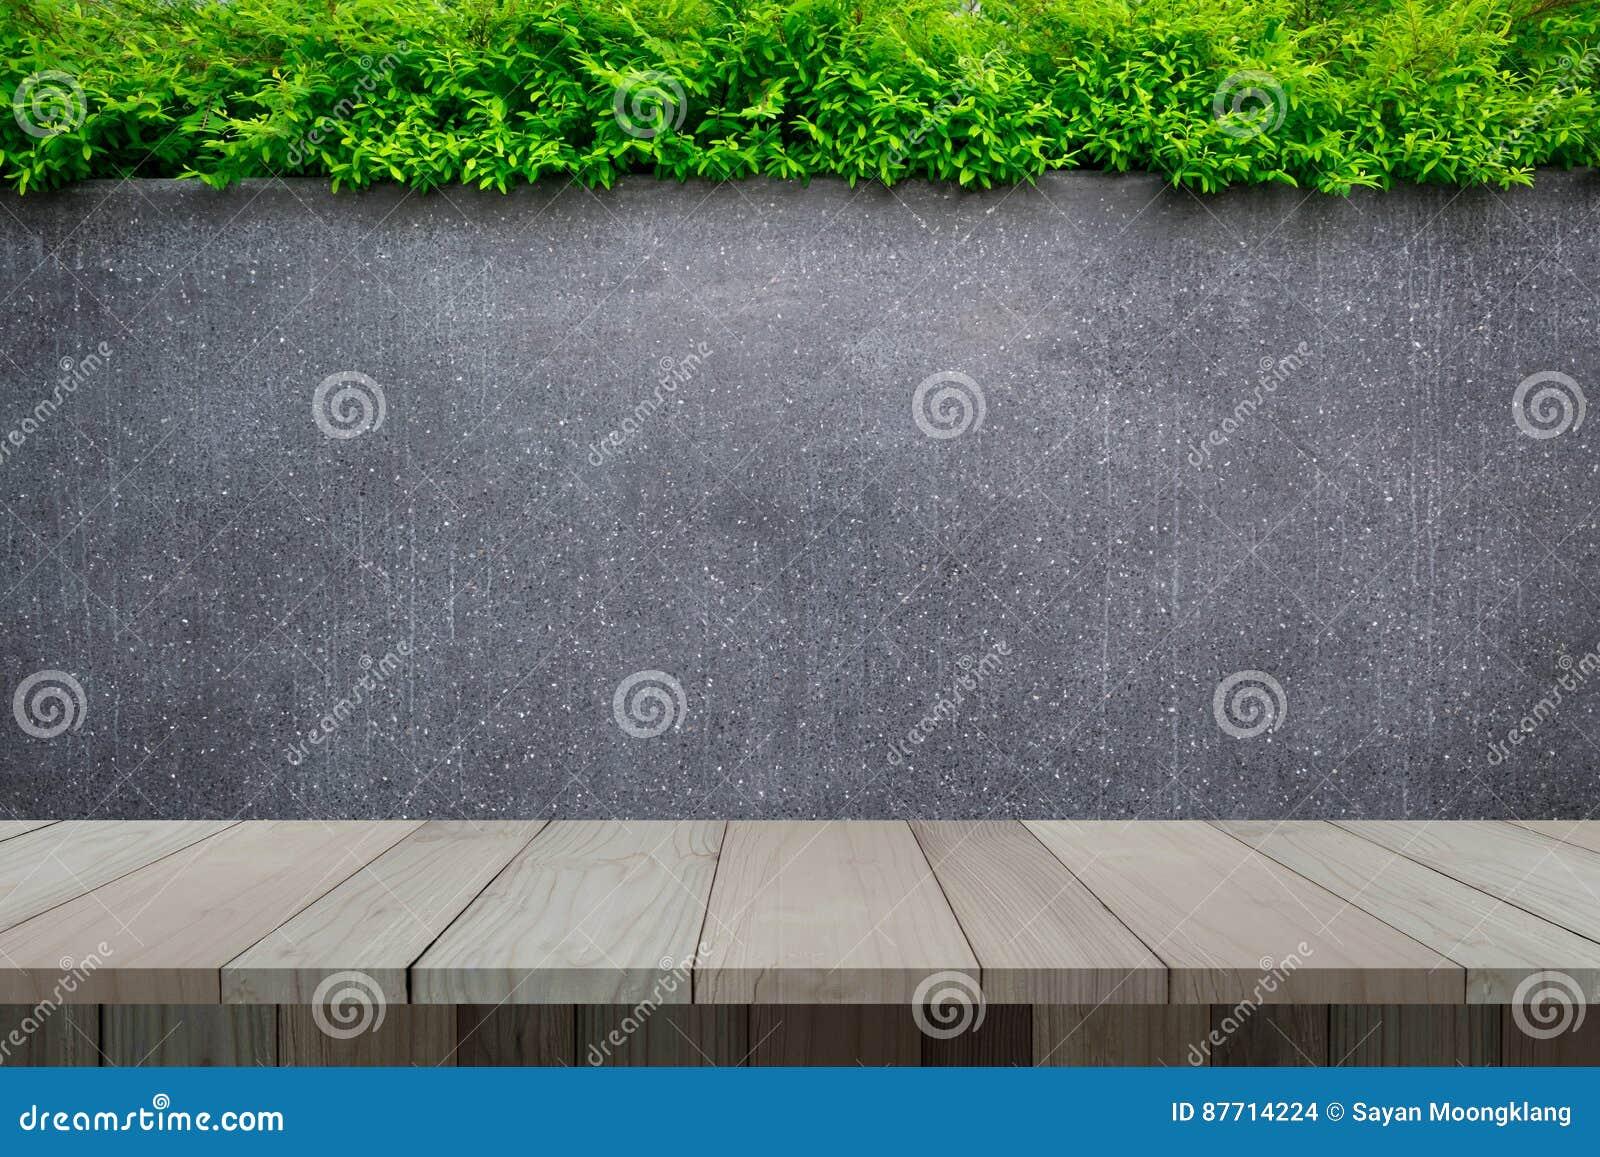 Mattonelle per giardino in cemento beautiful elegant best